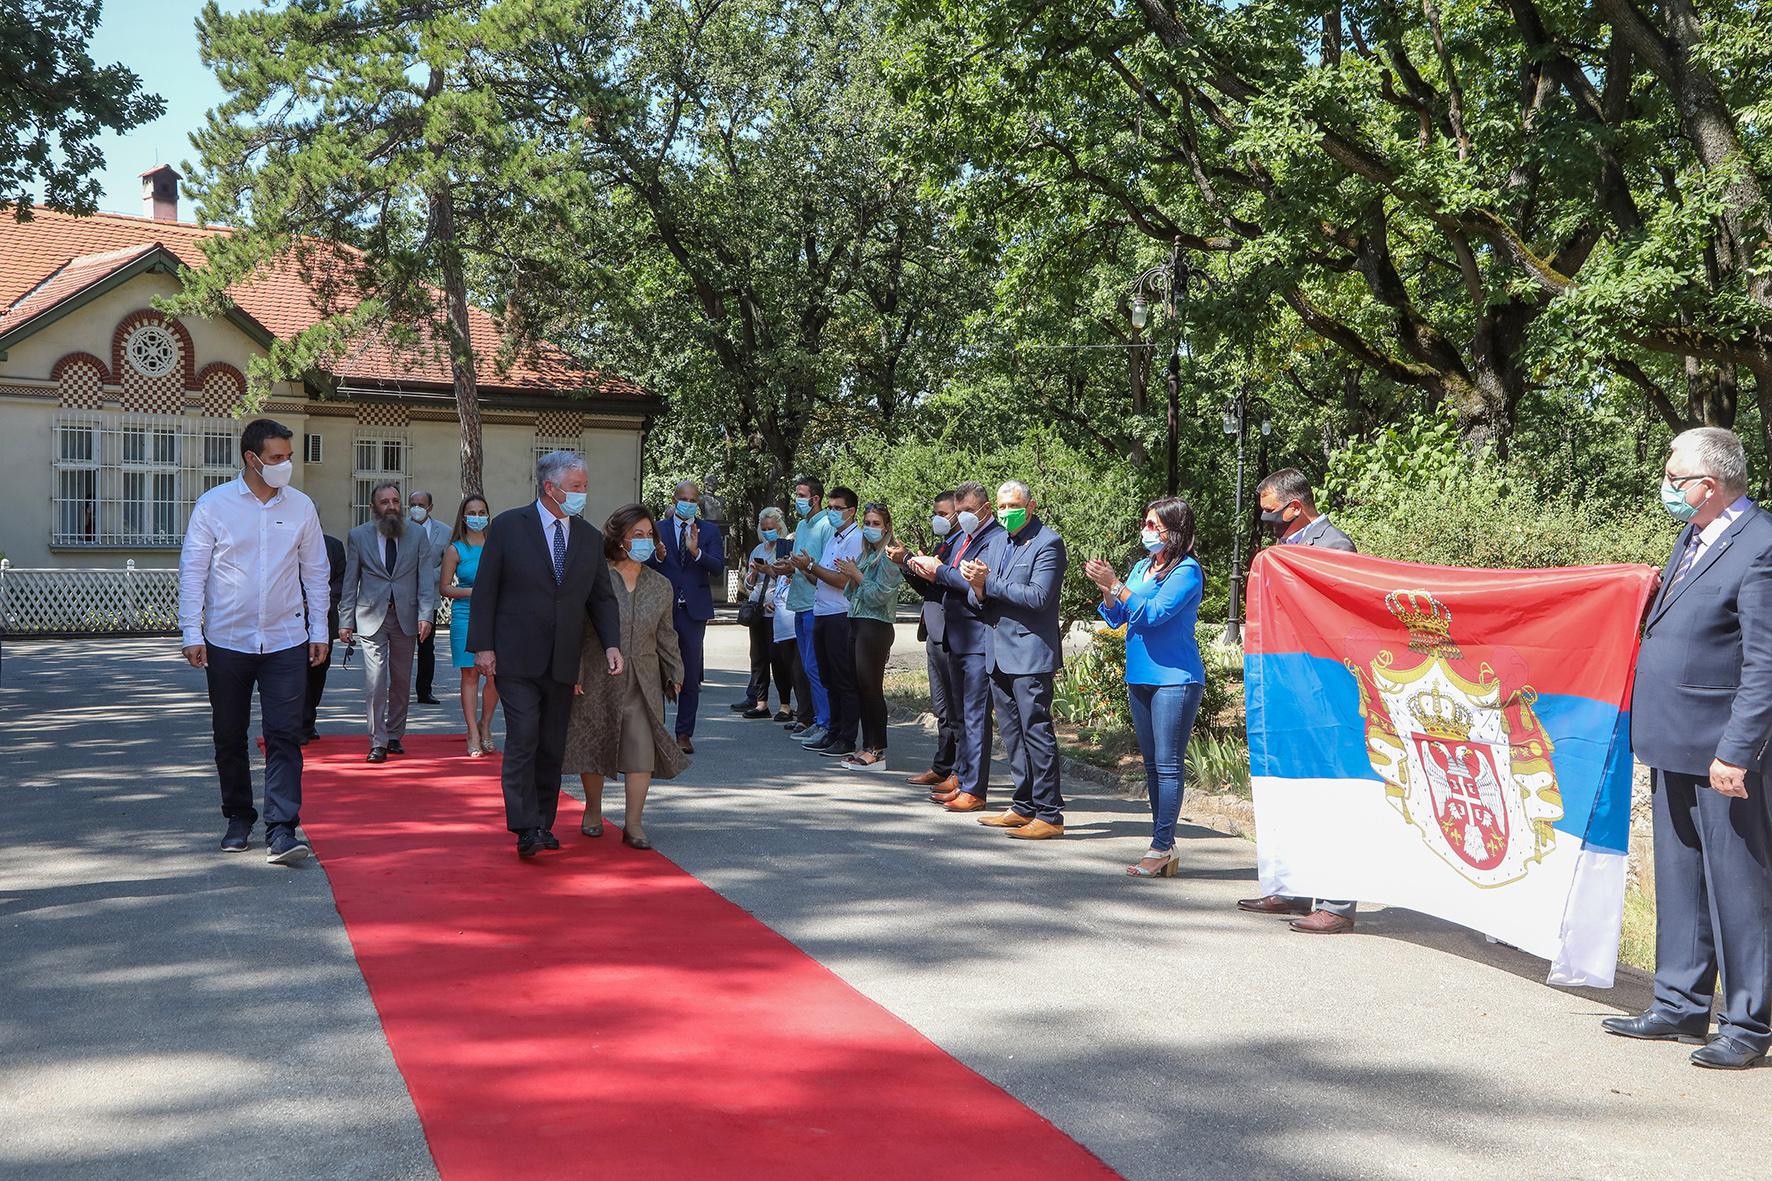 Kingdom of Serbia Association welcomes TRH at Oplenac